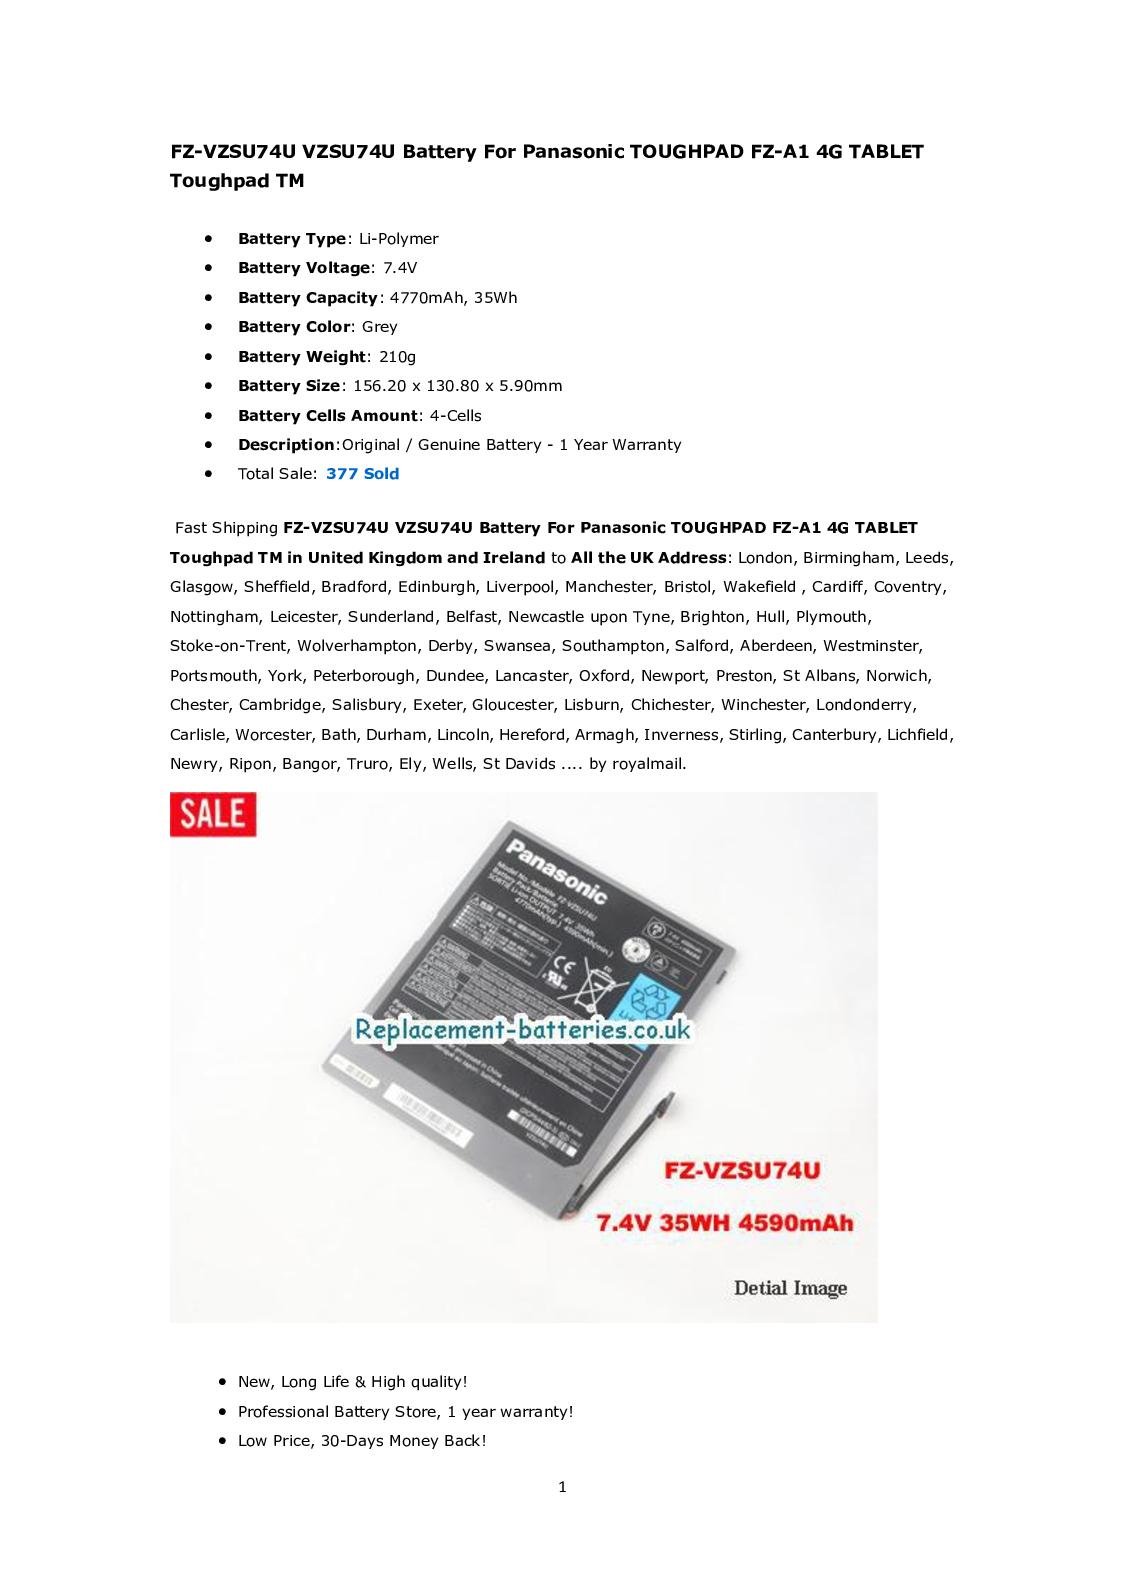 Calaméo - FZ-VZSU74U VZSU74U Battery For Panasonic TOUGHPAD FZ-A1 4G